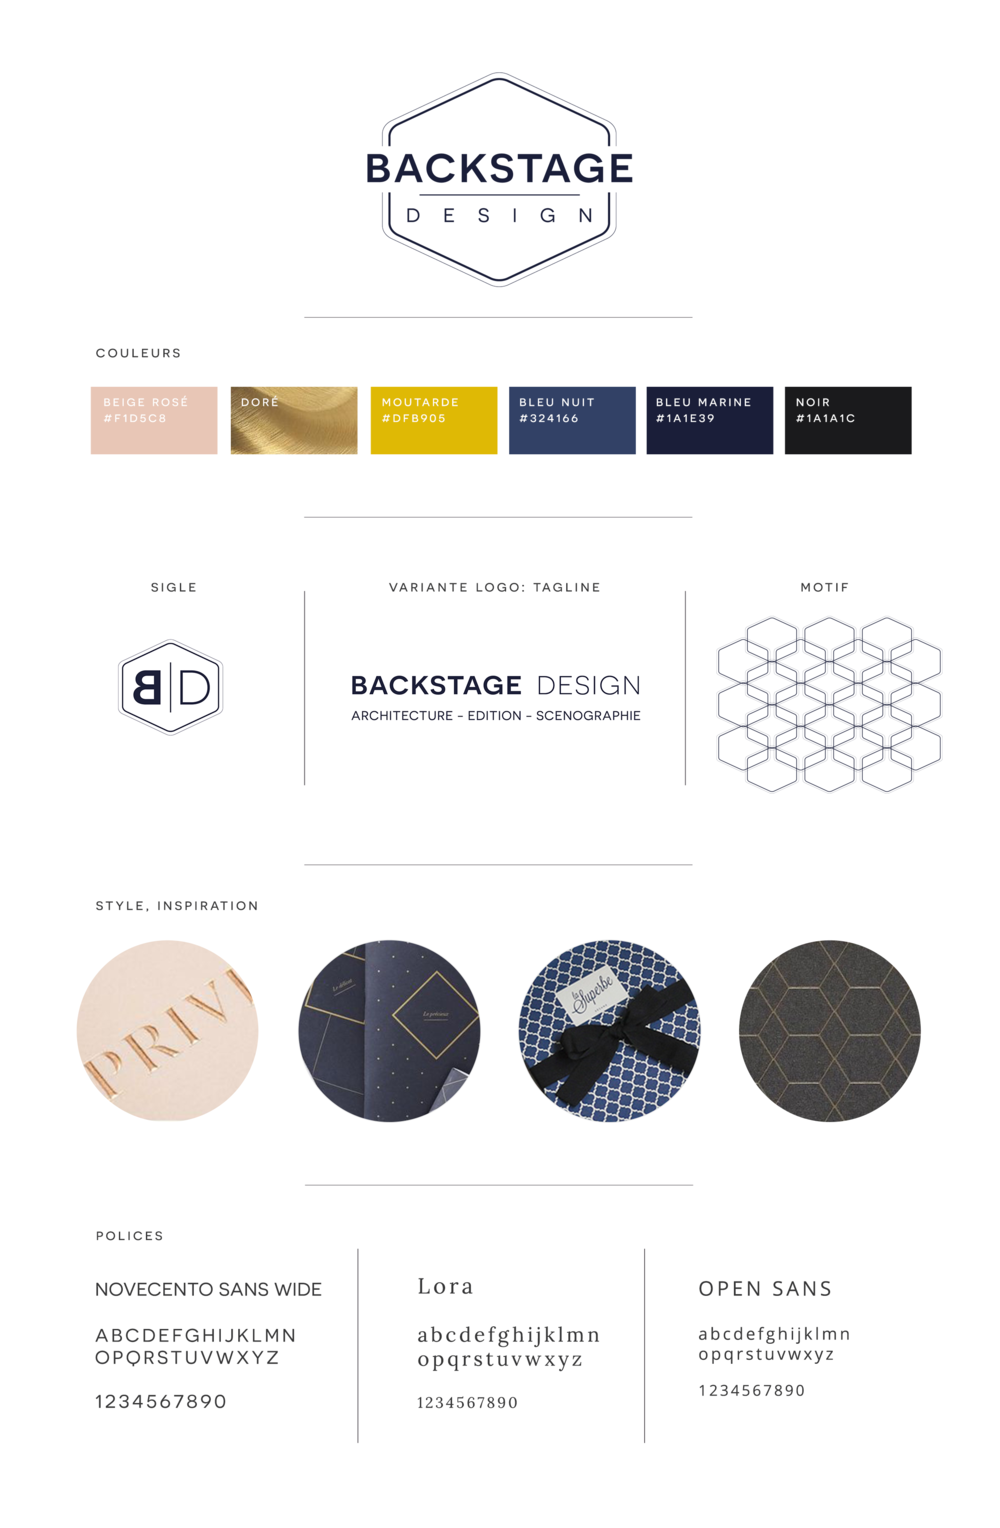 Brand Board Identité visuelle Backstage Design Architecture Edition Scenographie par Hello Nobo